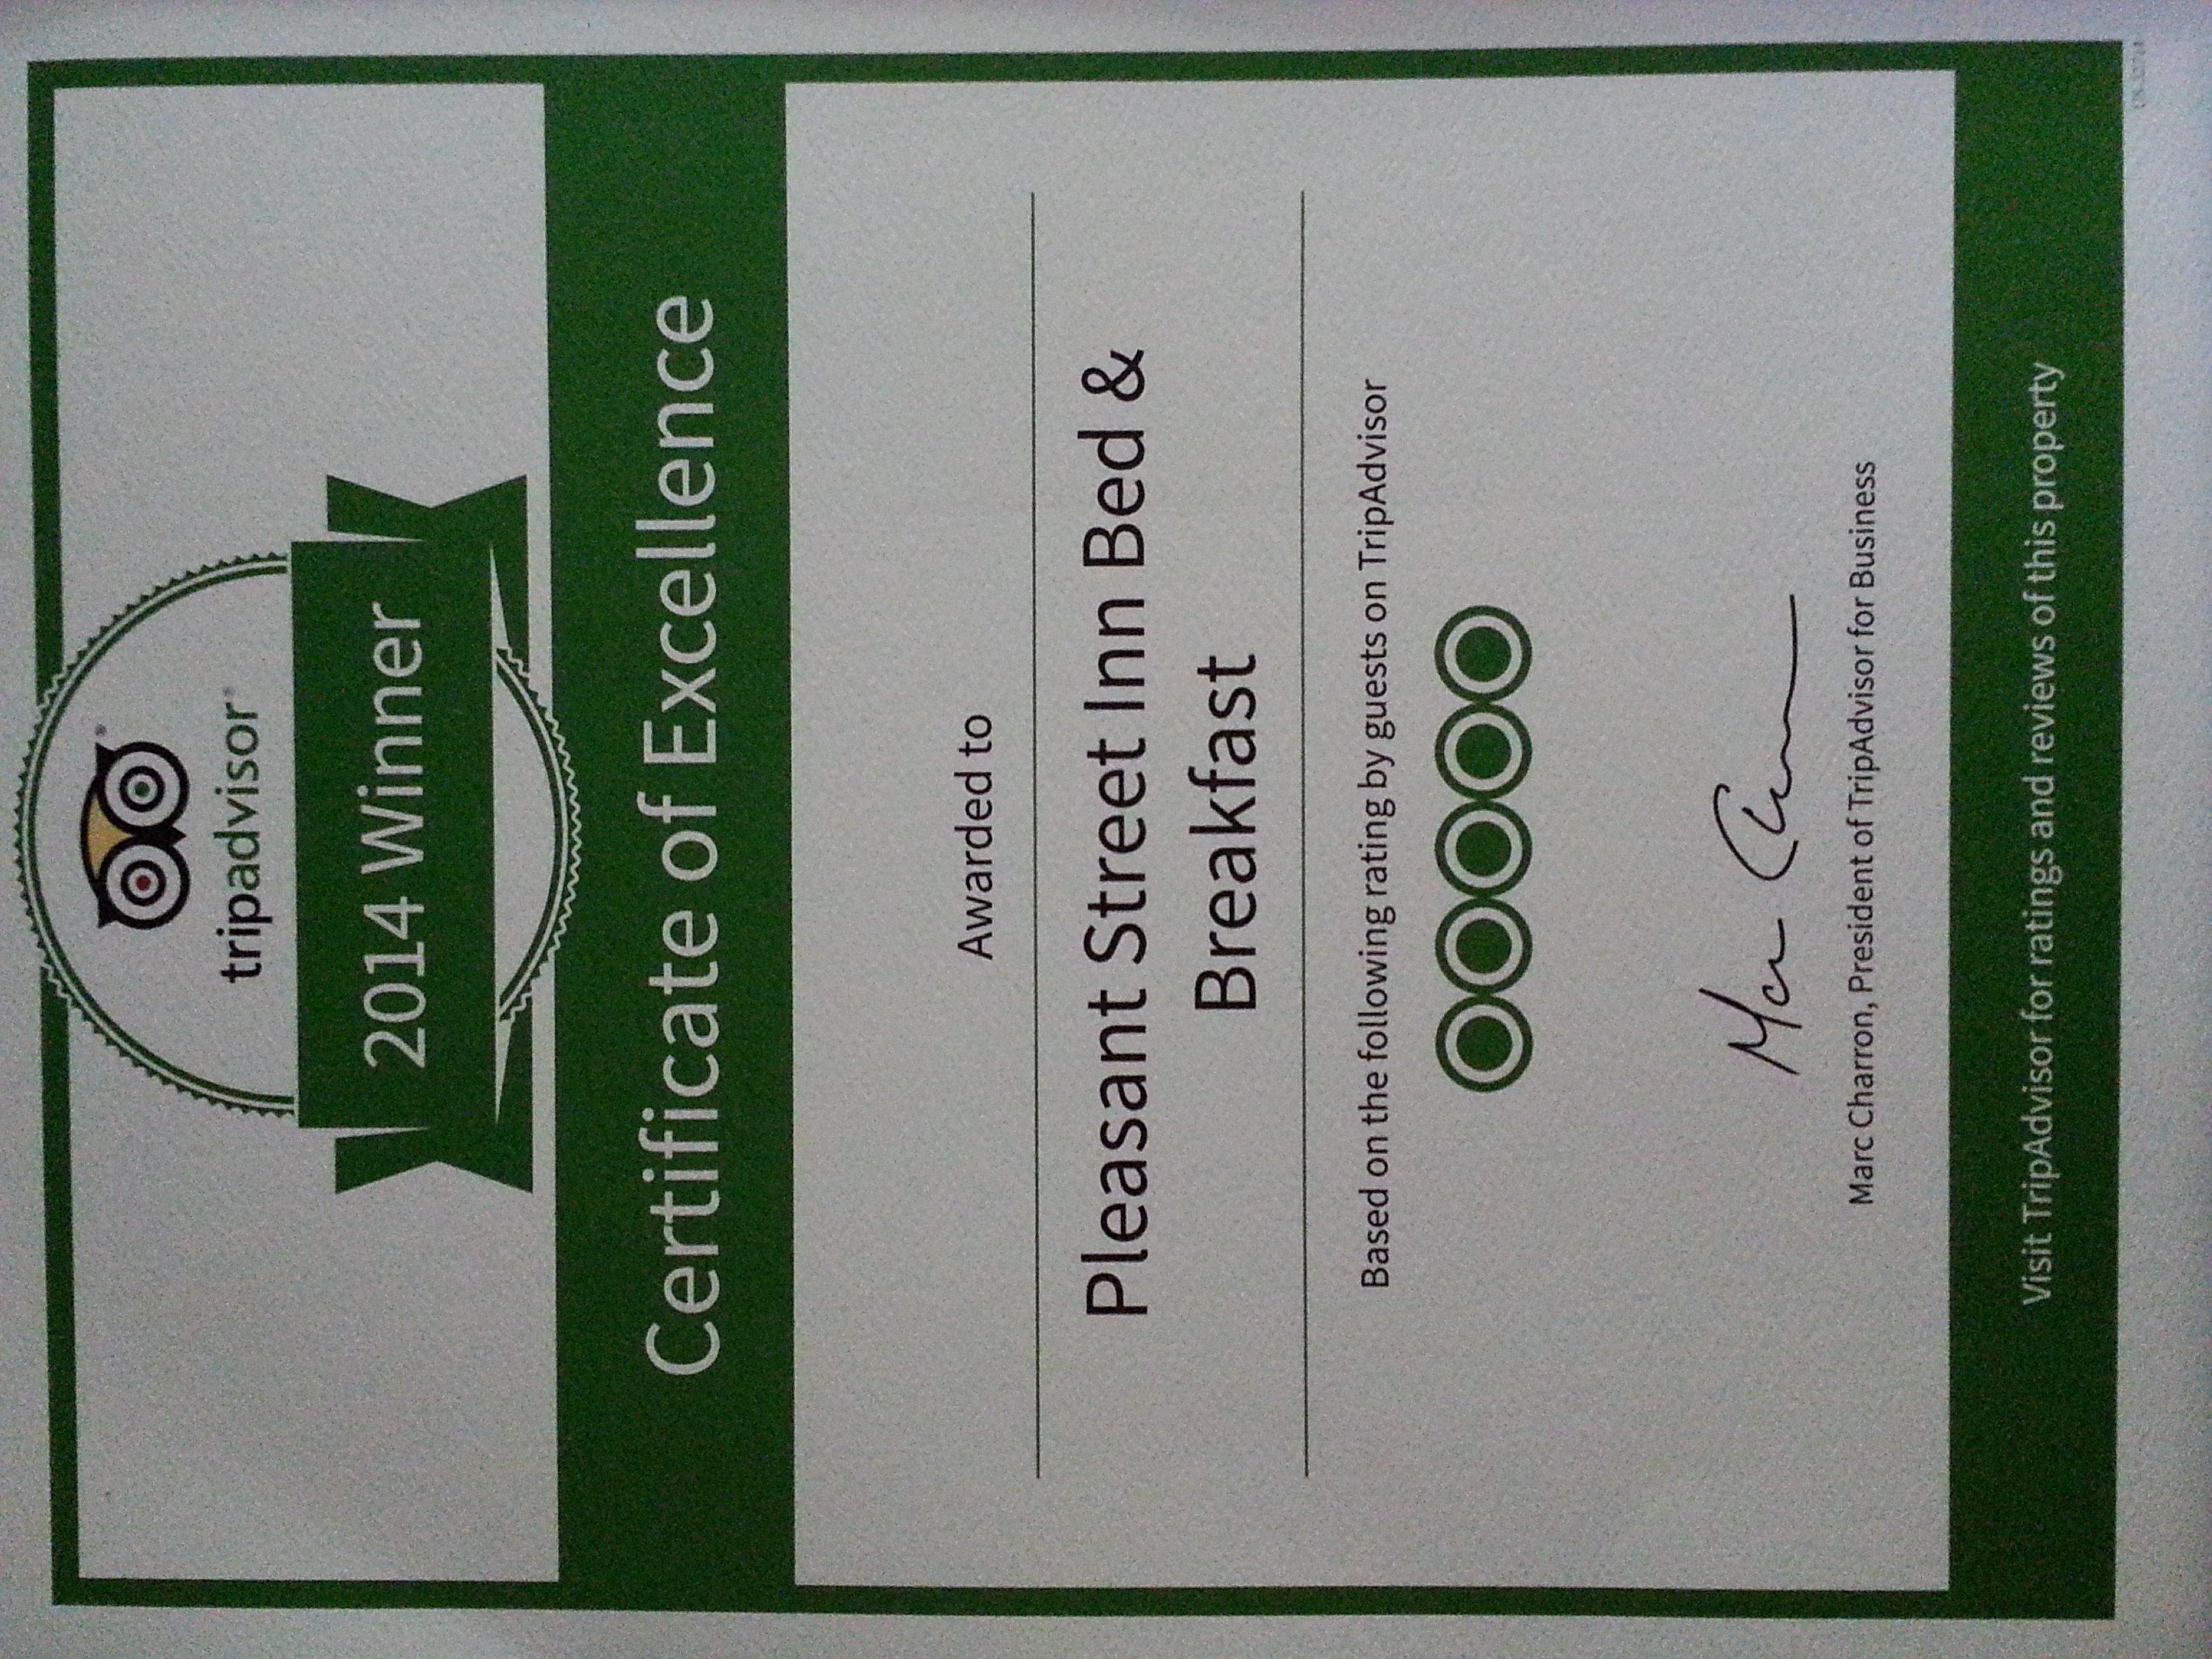 2014 TripAdvisor Certificate of Excellence